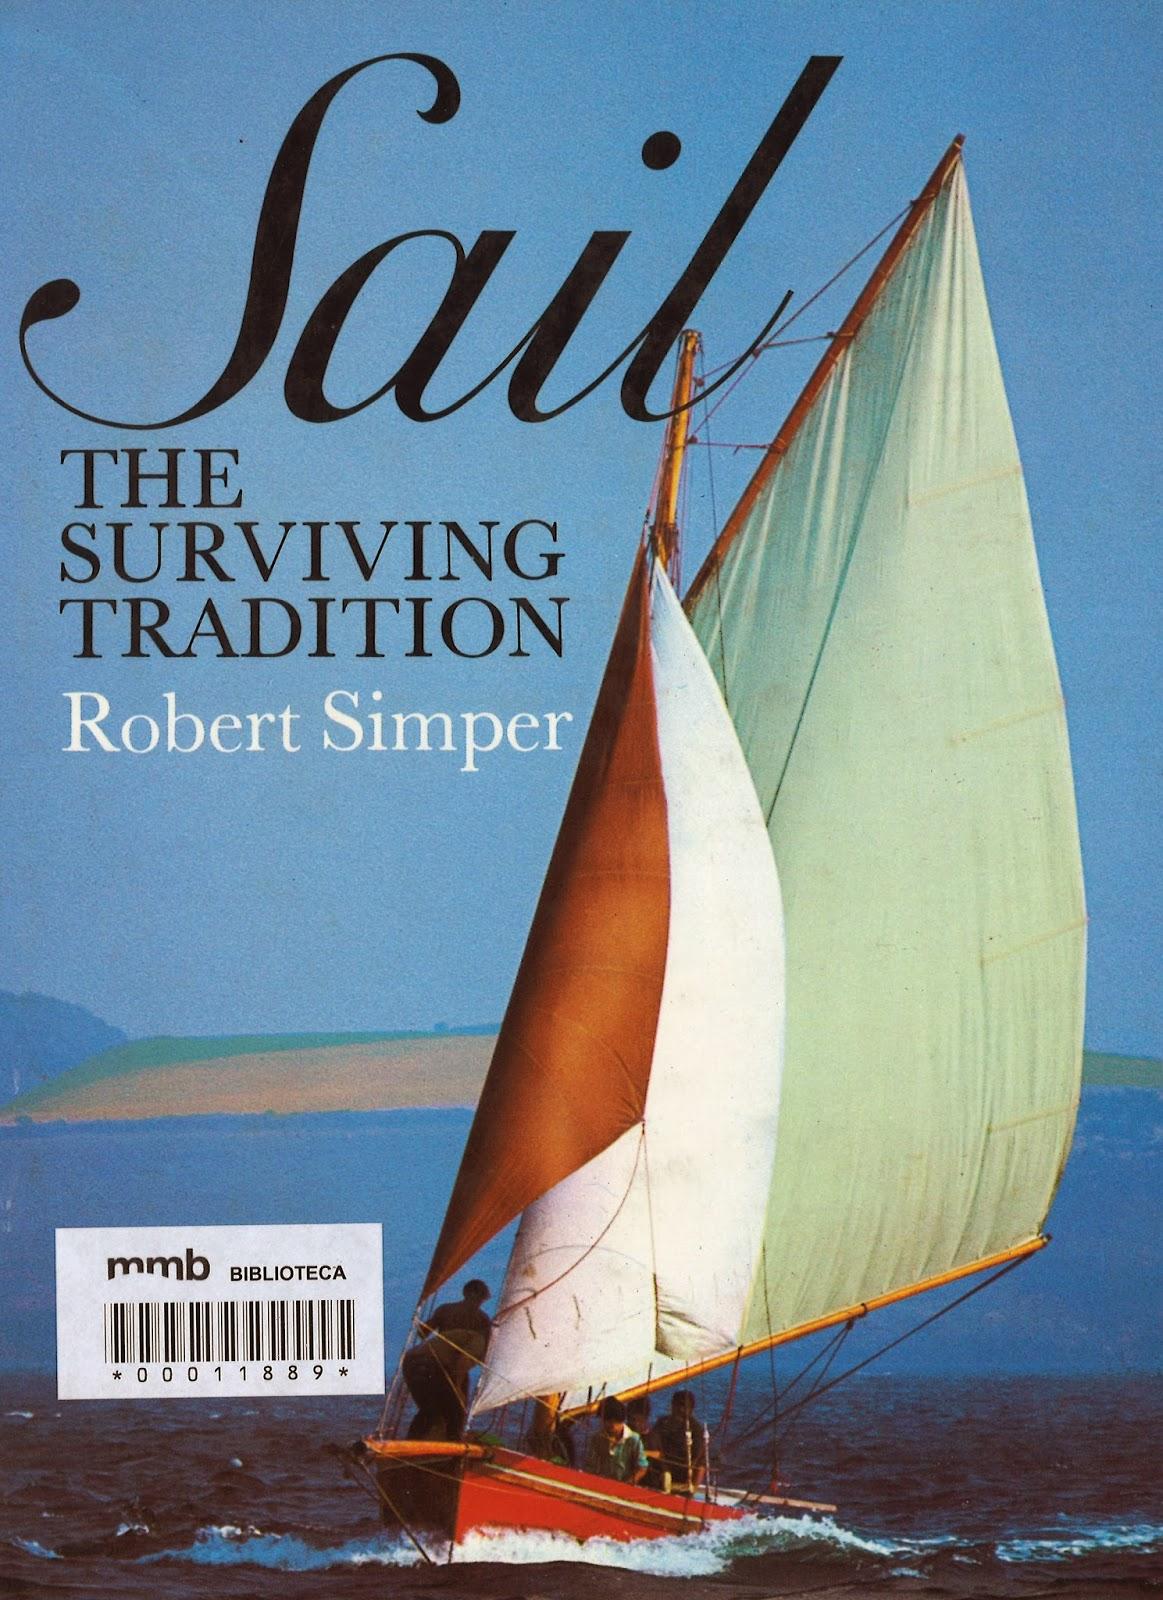 Robert Simper